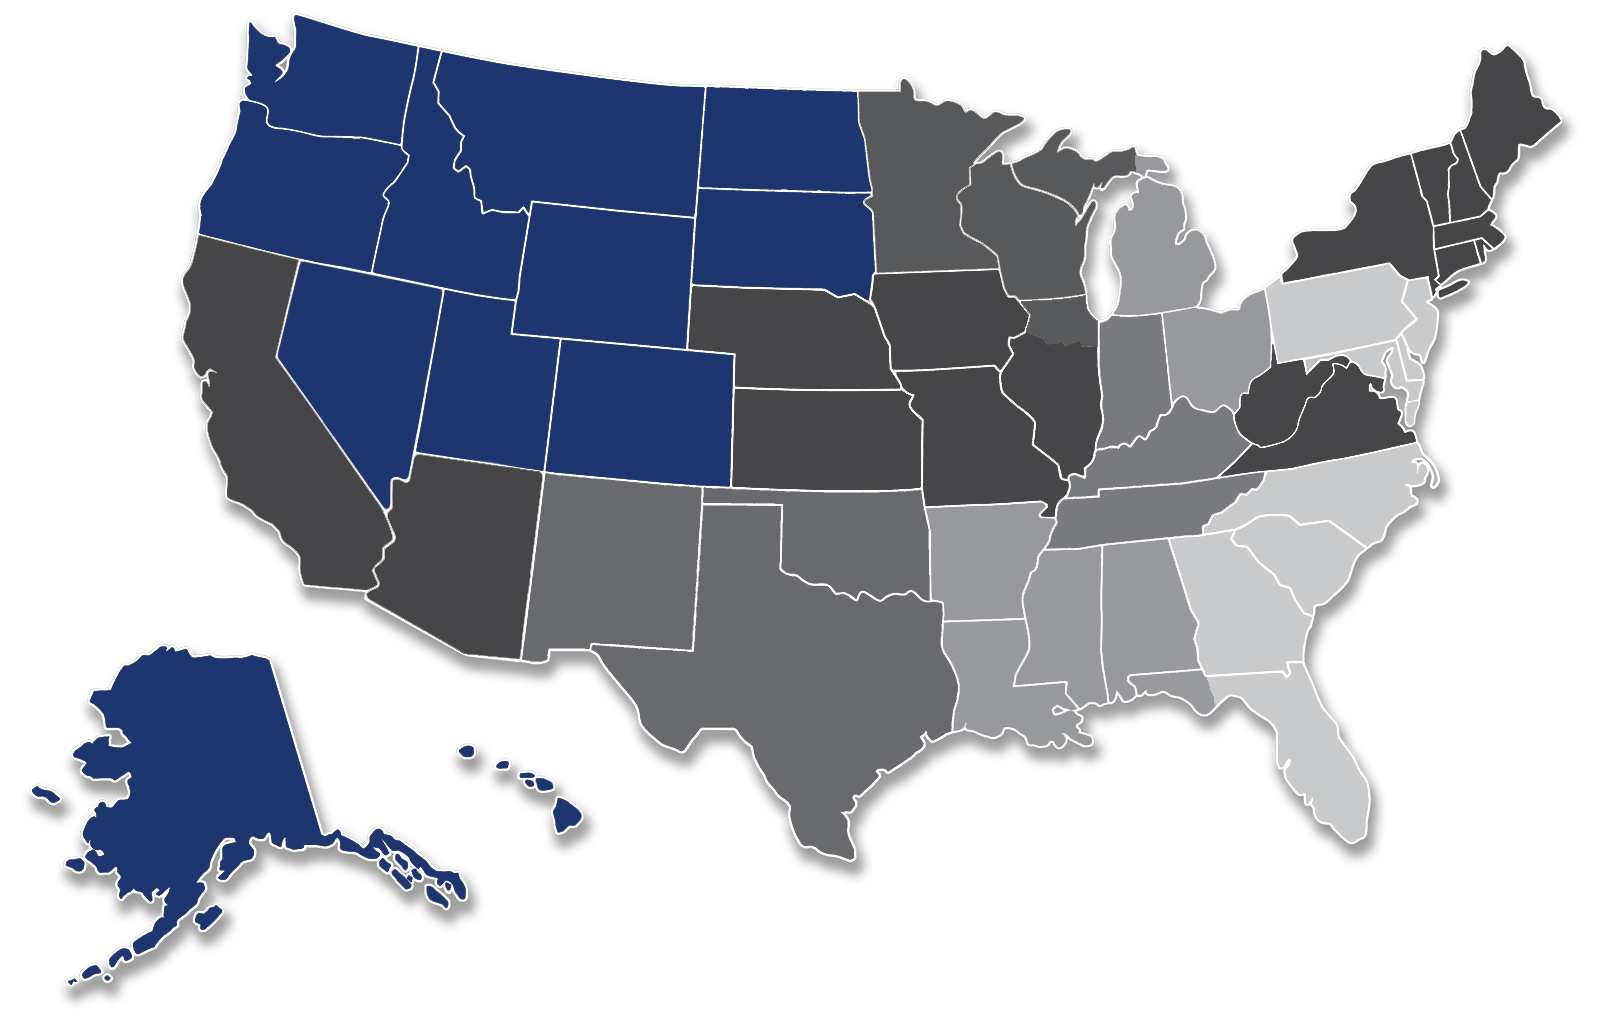 T2 - Northwest/Mountian States Territory